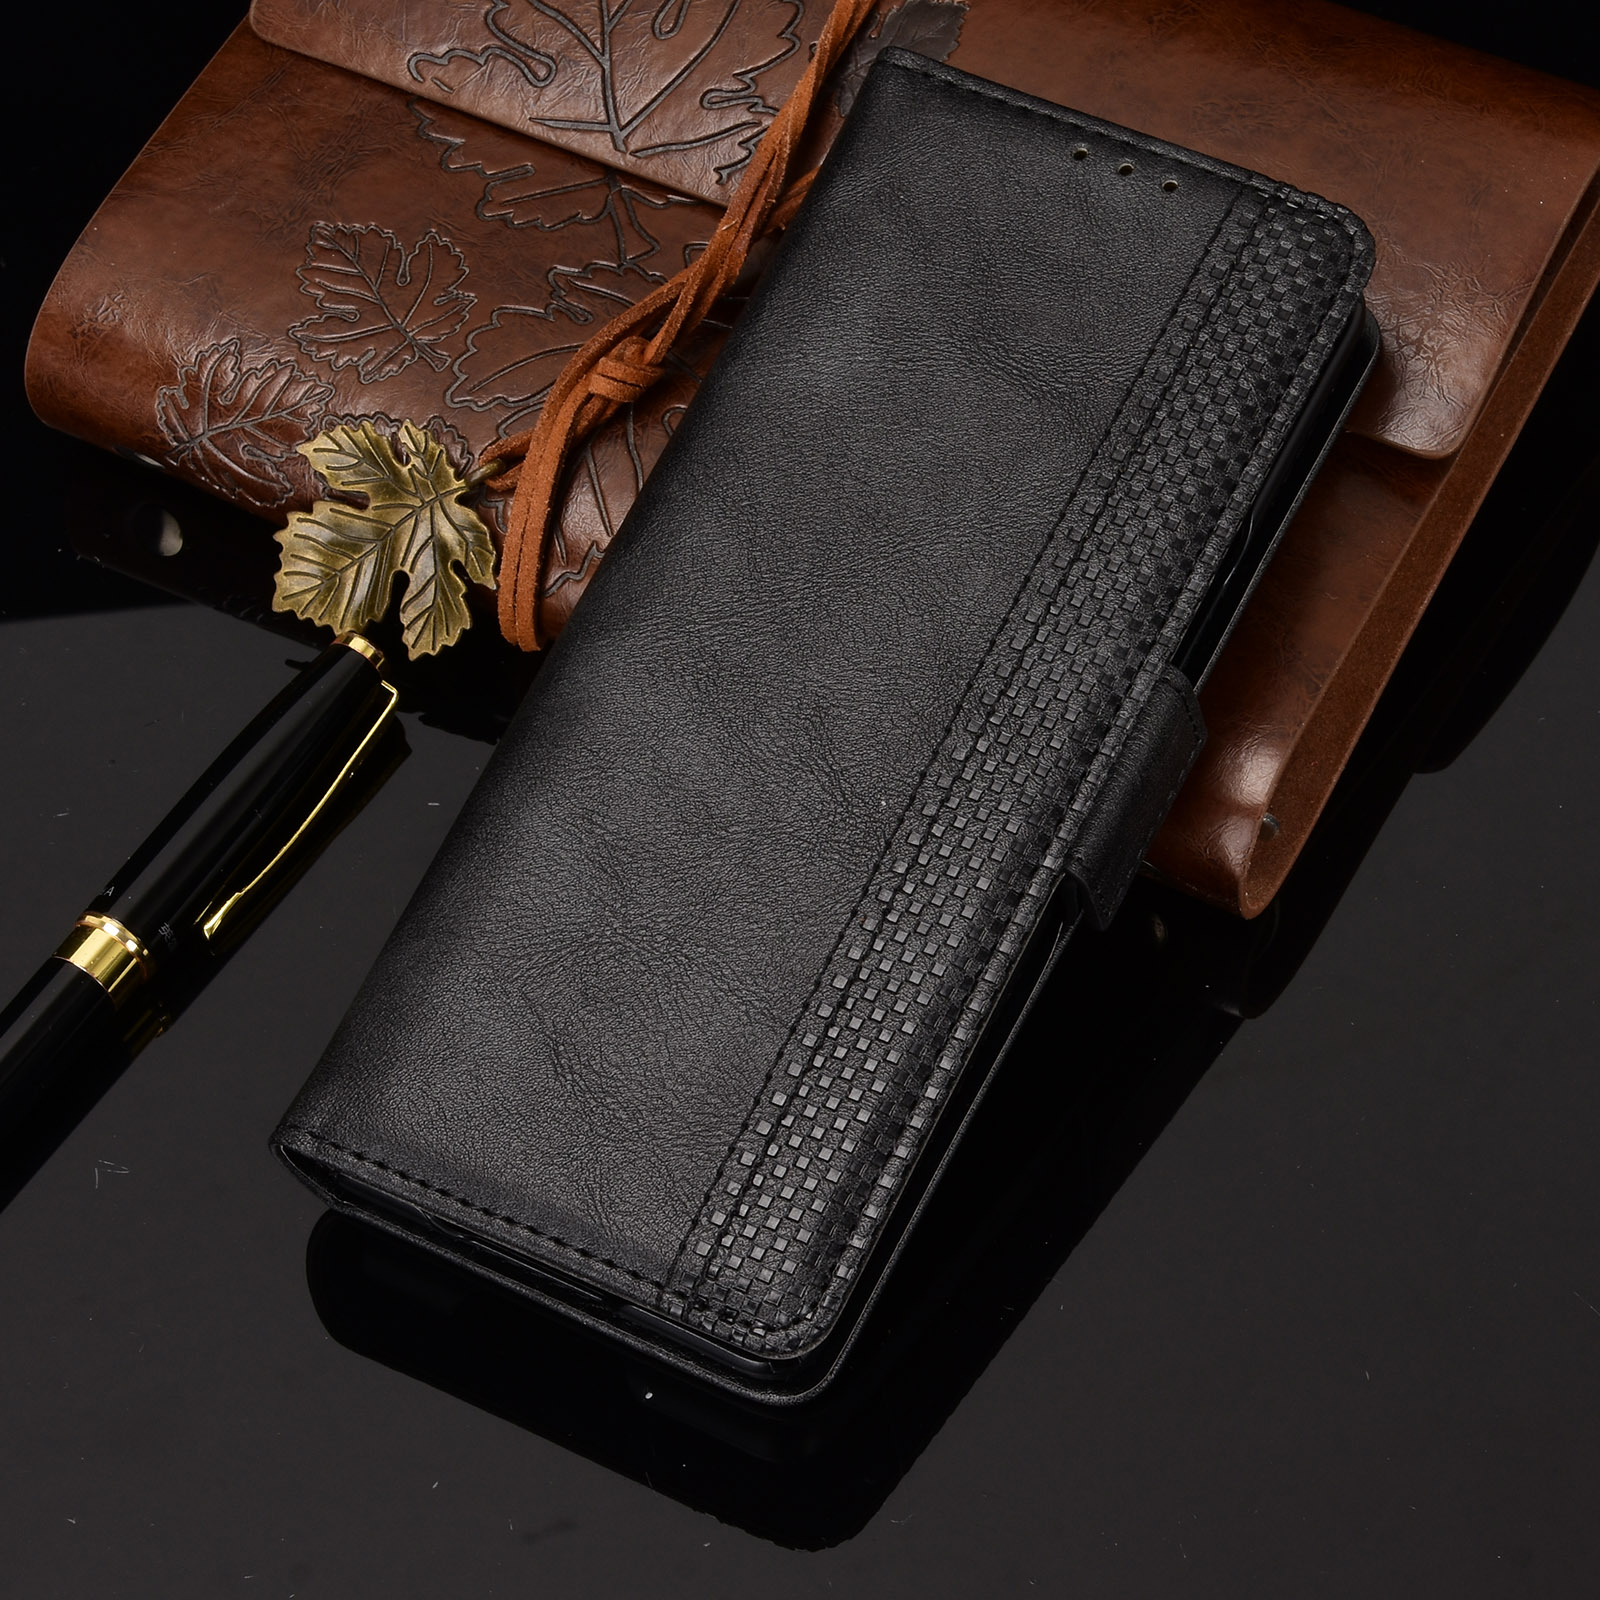 Custodia per Galaxy Z Fold 2 custodia in pelle PU Premium Flip Cover per Samsung Galaxy Z Fold 2 5G